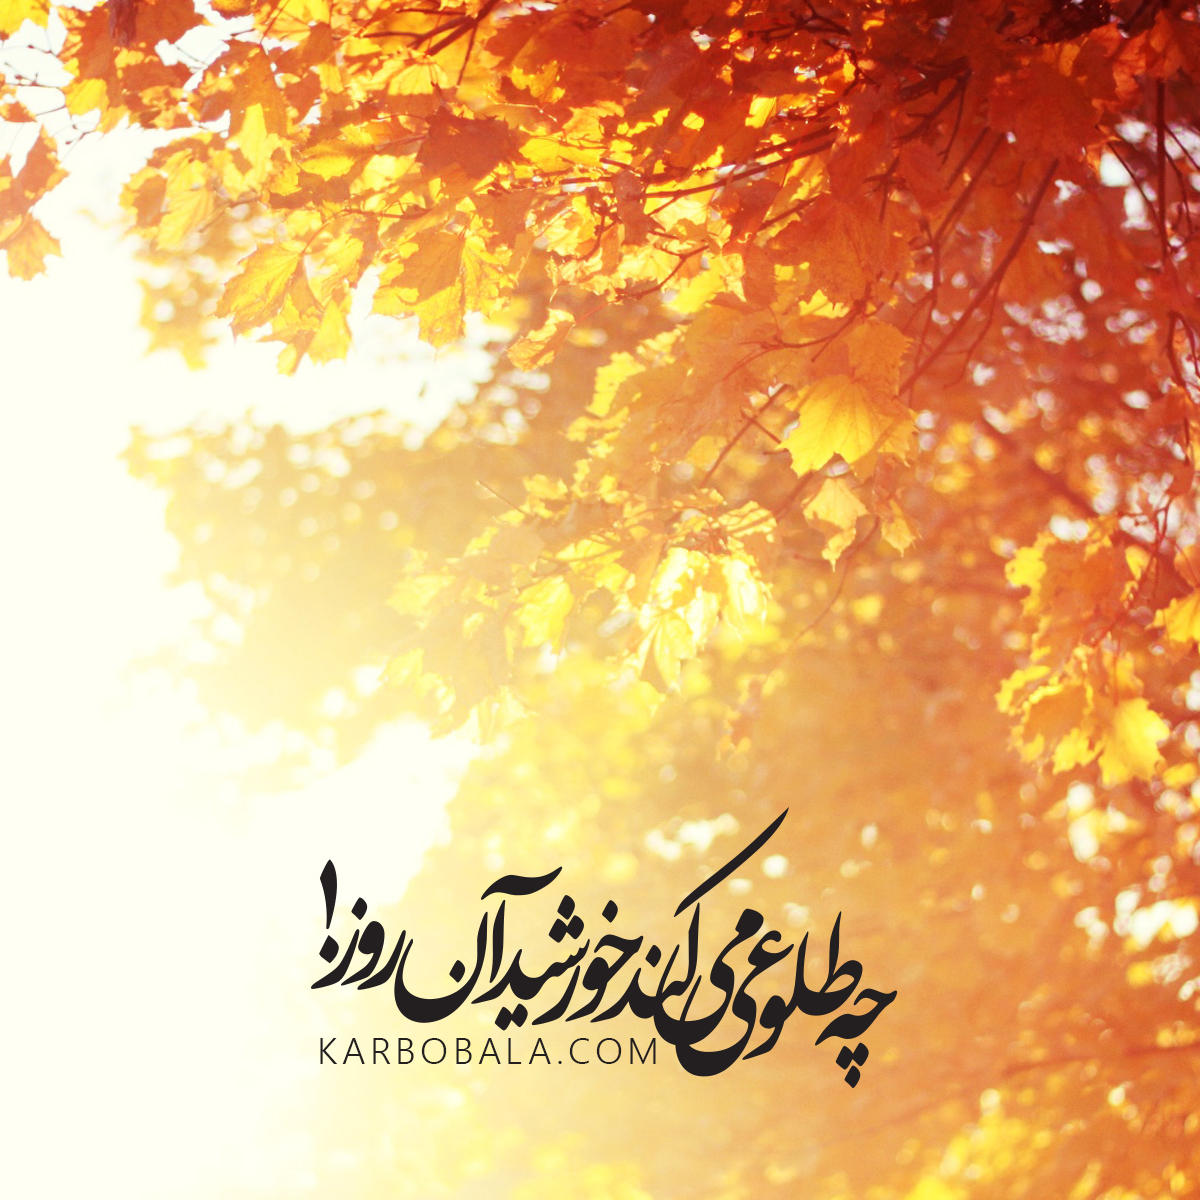 Mobile_Wallpaper(186)-Karbobala.com